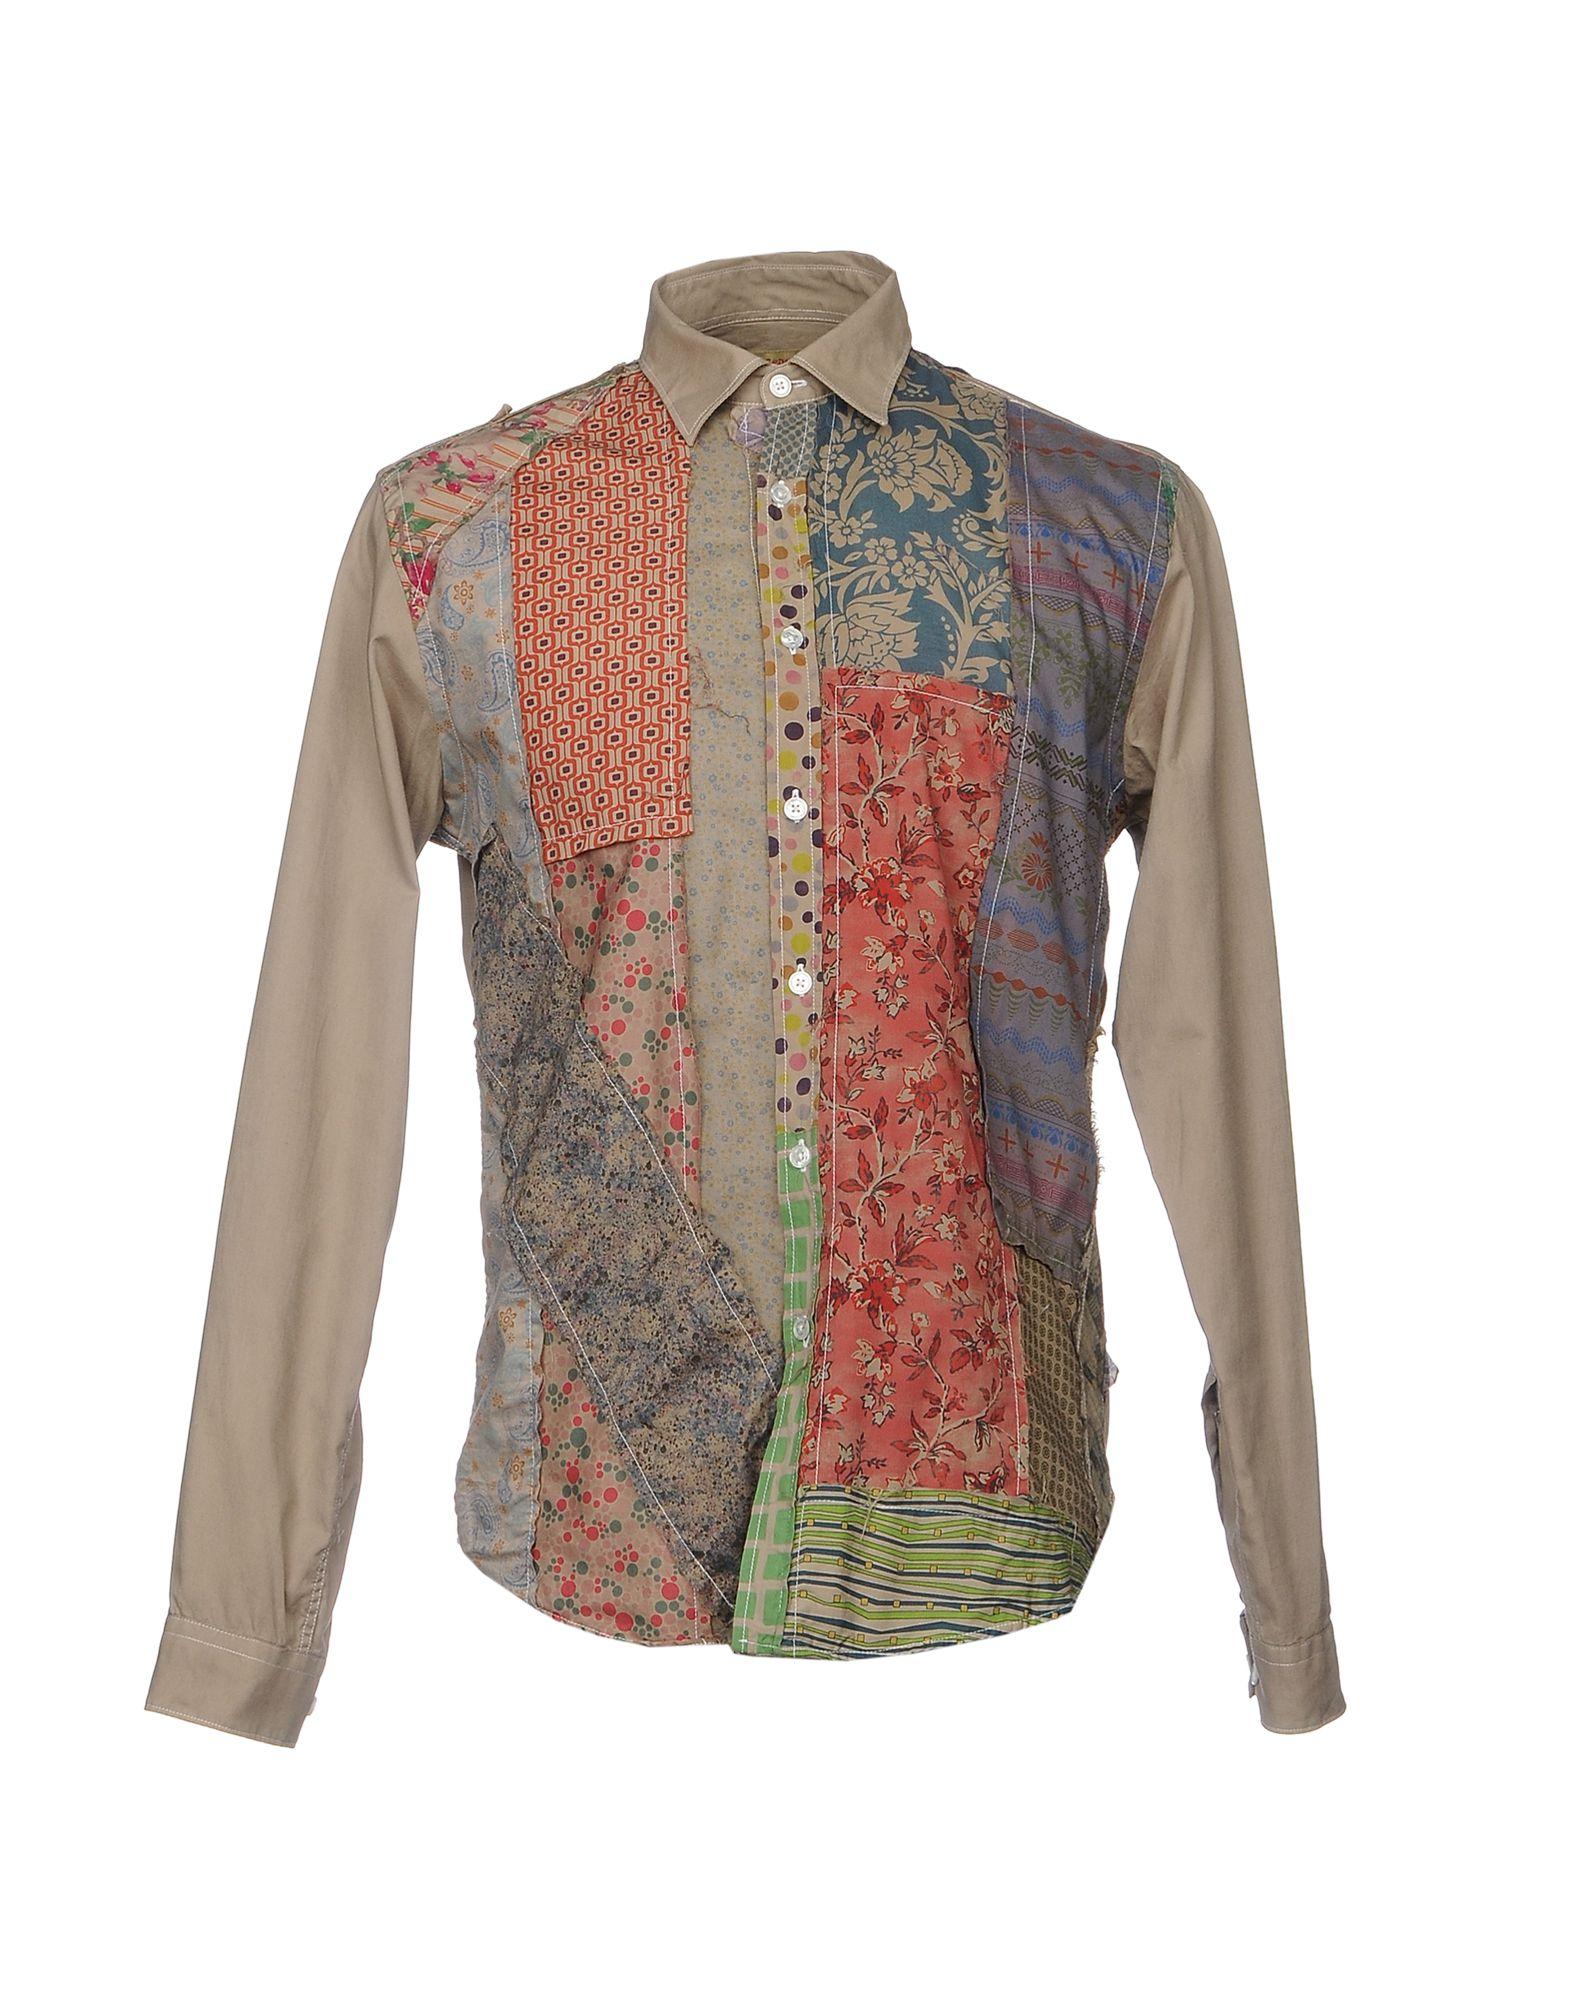 BEAT GENERATION Herren Hemd Farbe Khaki Größe 7